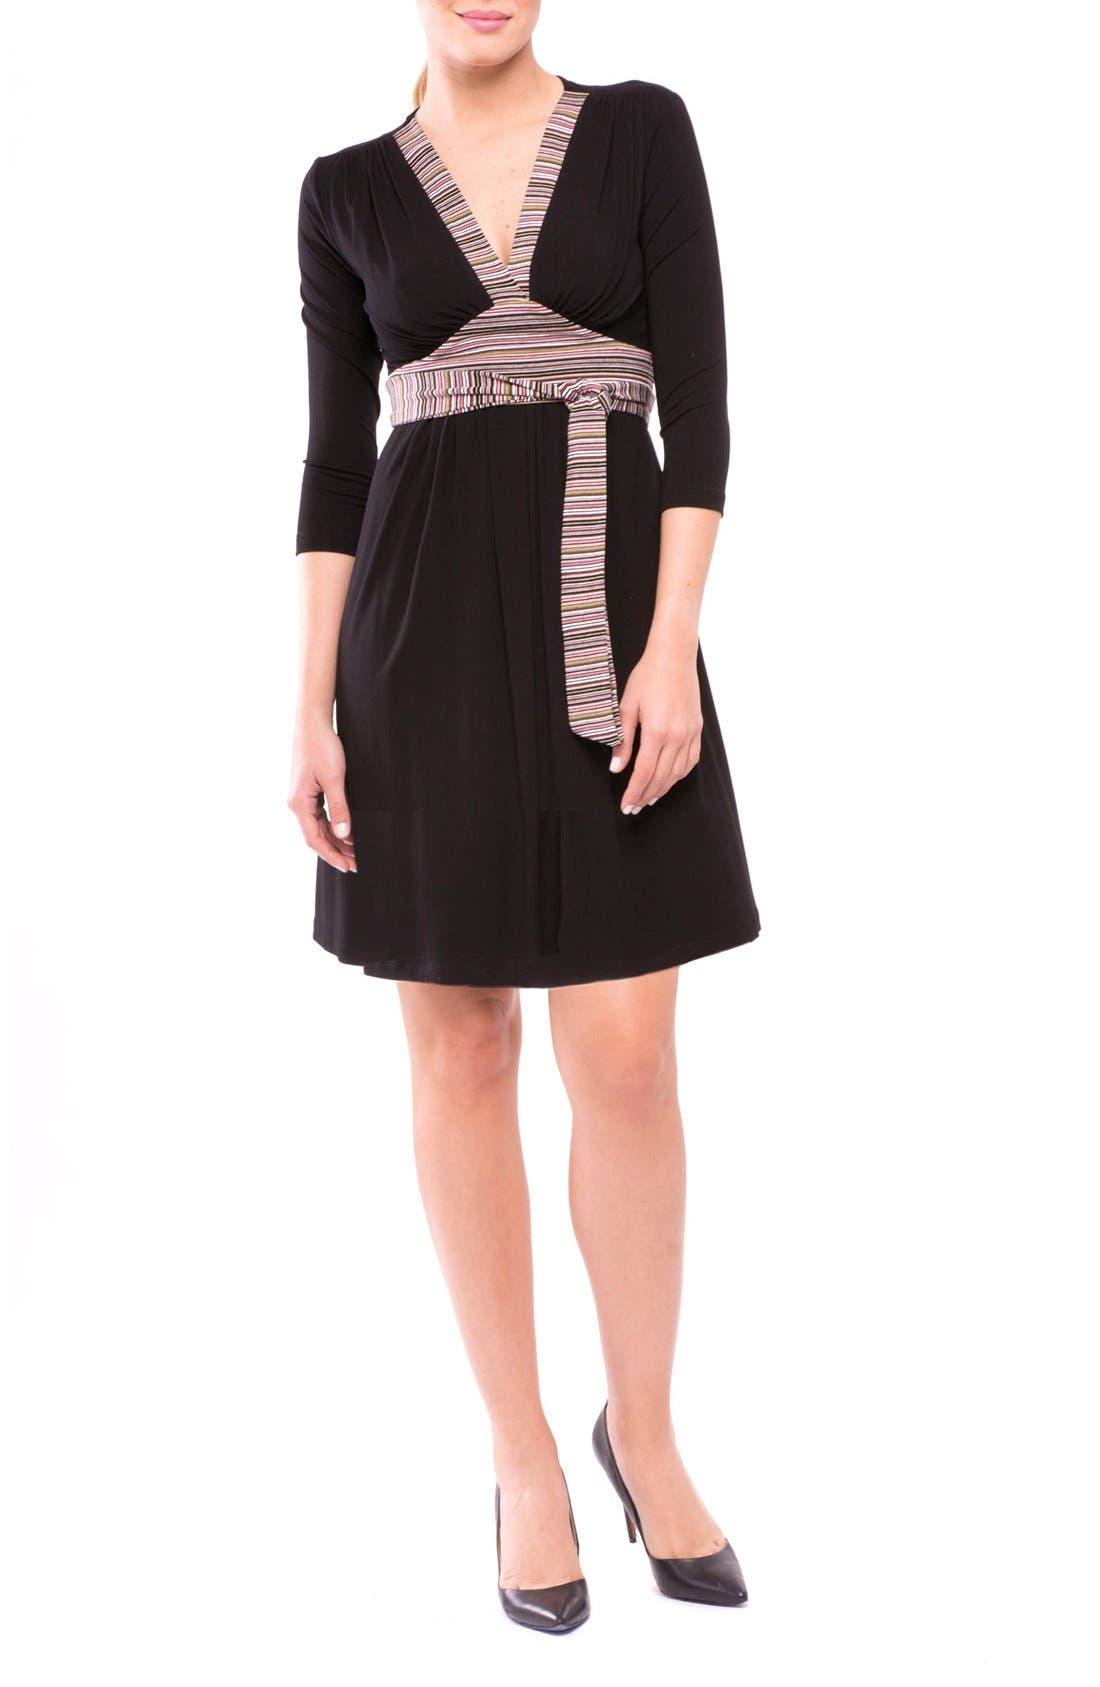 Olian Audrey Maternity/Nursing Dress